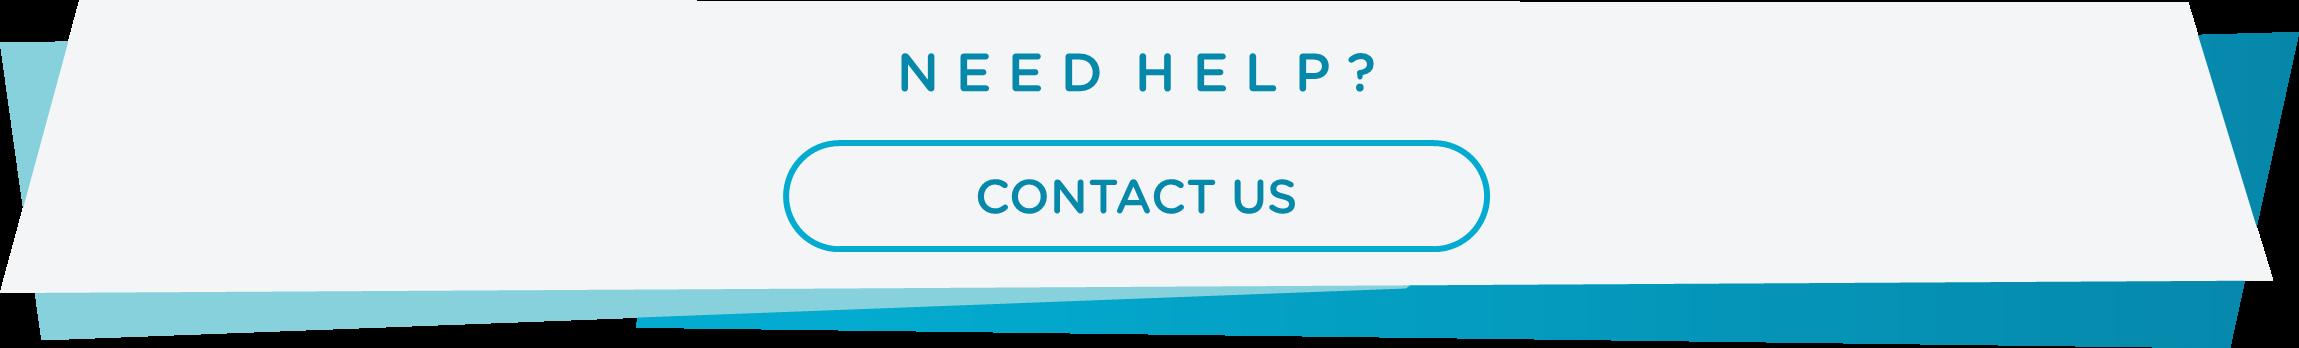 Need help, contact us